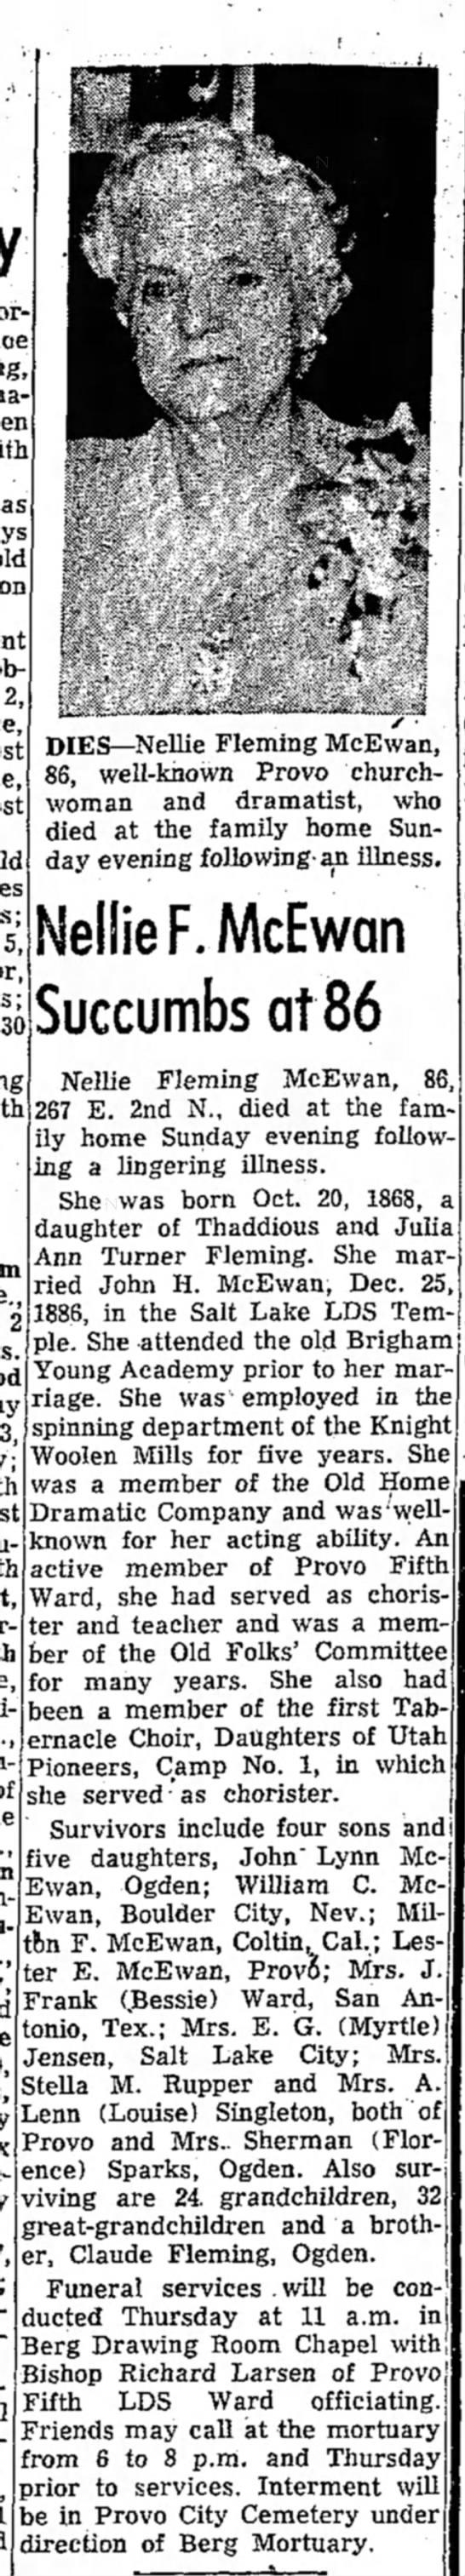 Pat's grandmother Nellie Fleming McEwan obit. - as 2, 5, 30 2 DIES—Nellie Fleming McEwan, 86,...